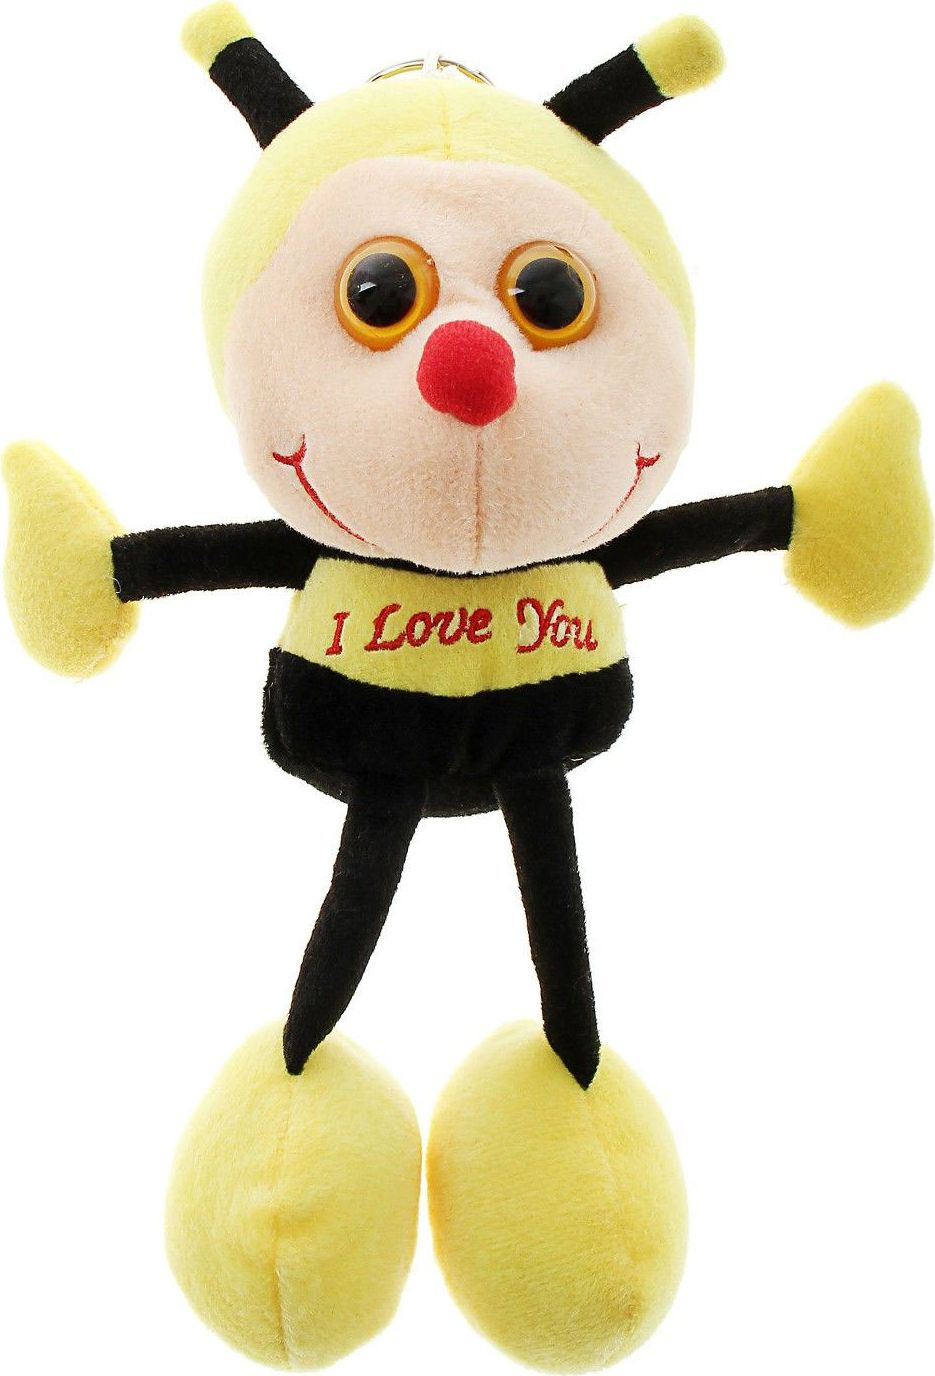 Sima-land Мягкая игрушка Пчелка с вышивкой на груди фонтант sima land летняя прохлада колодец